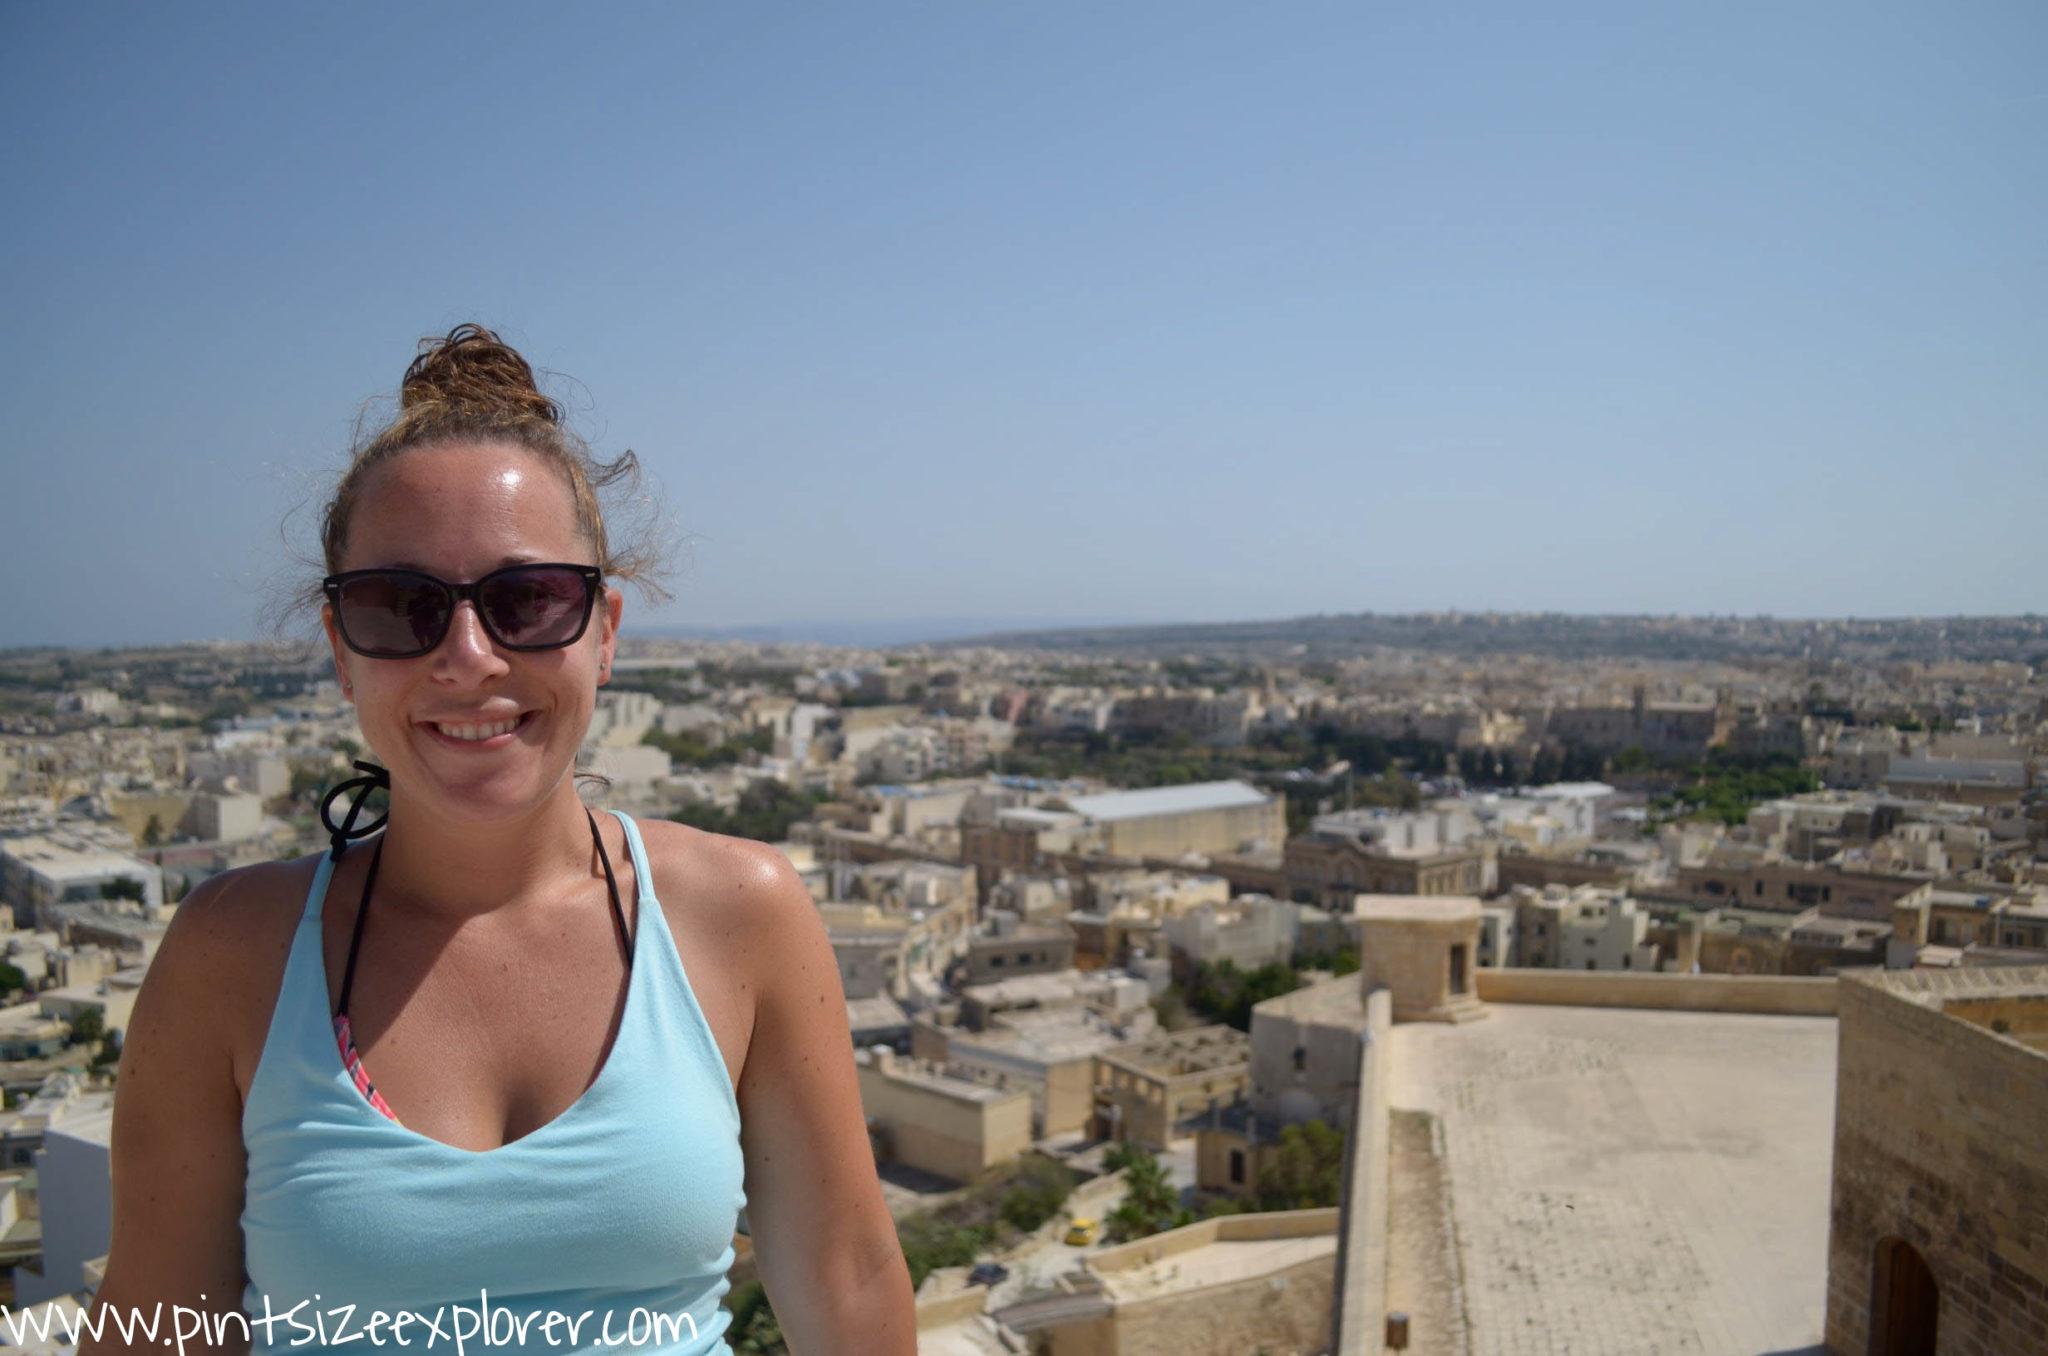 DSC_6140 - Malta